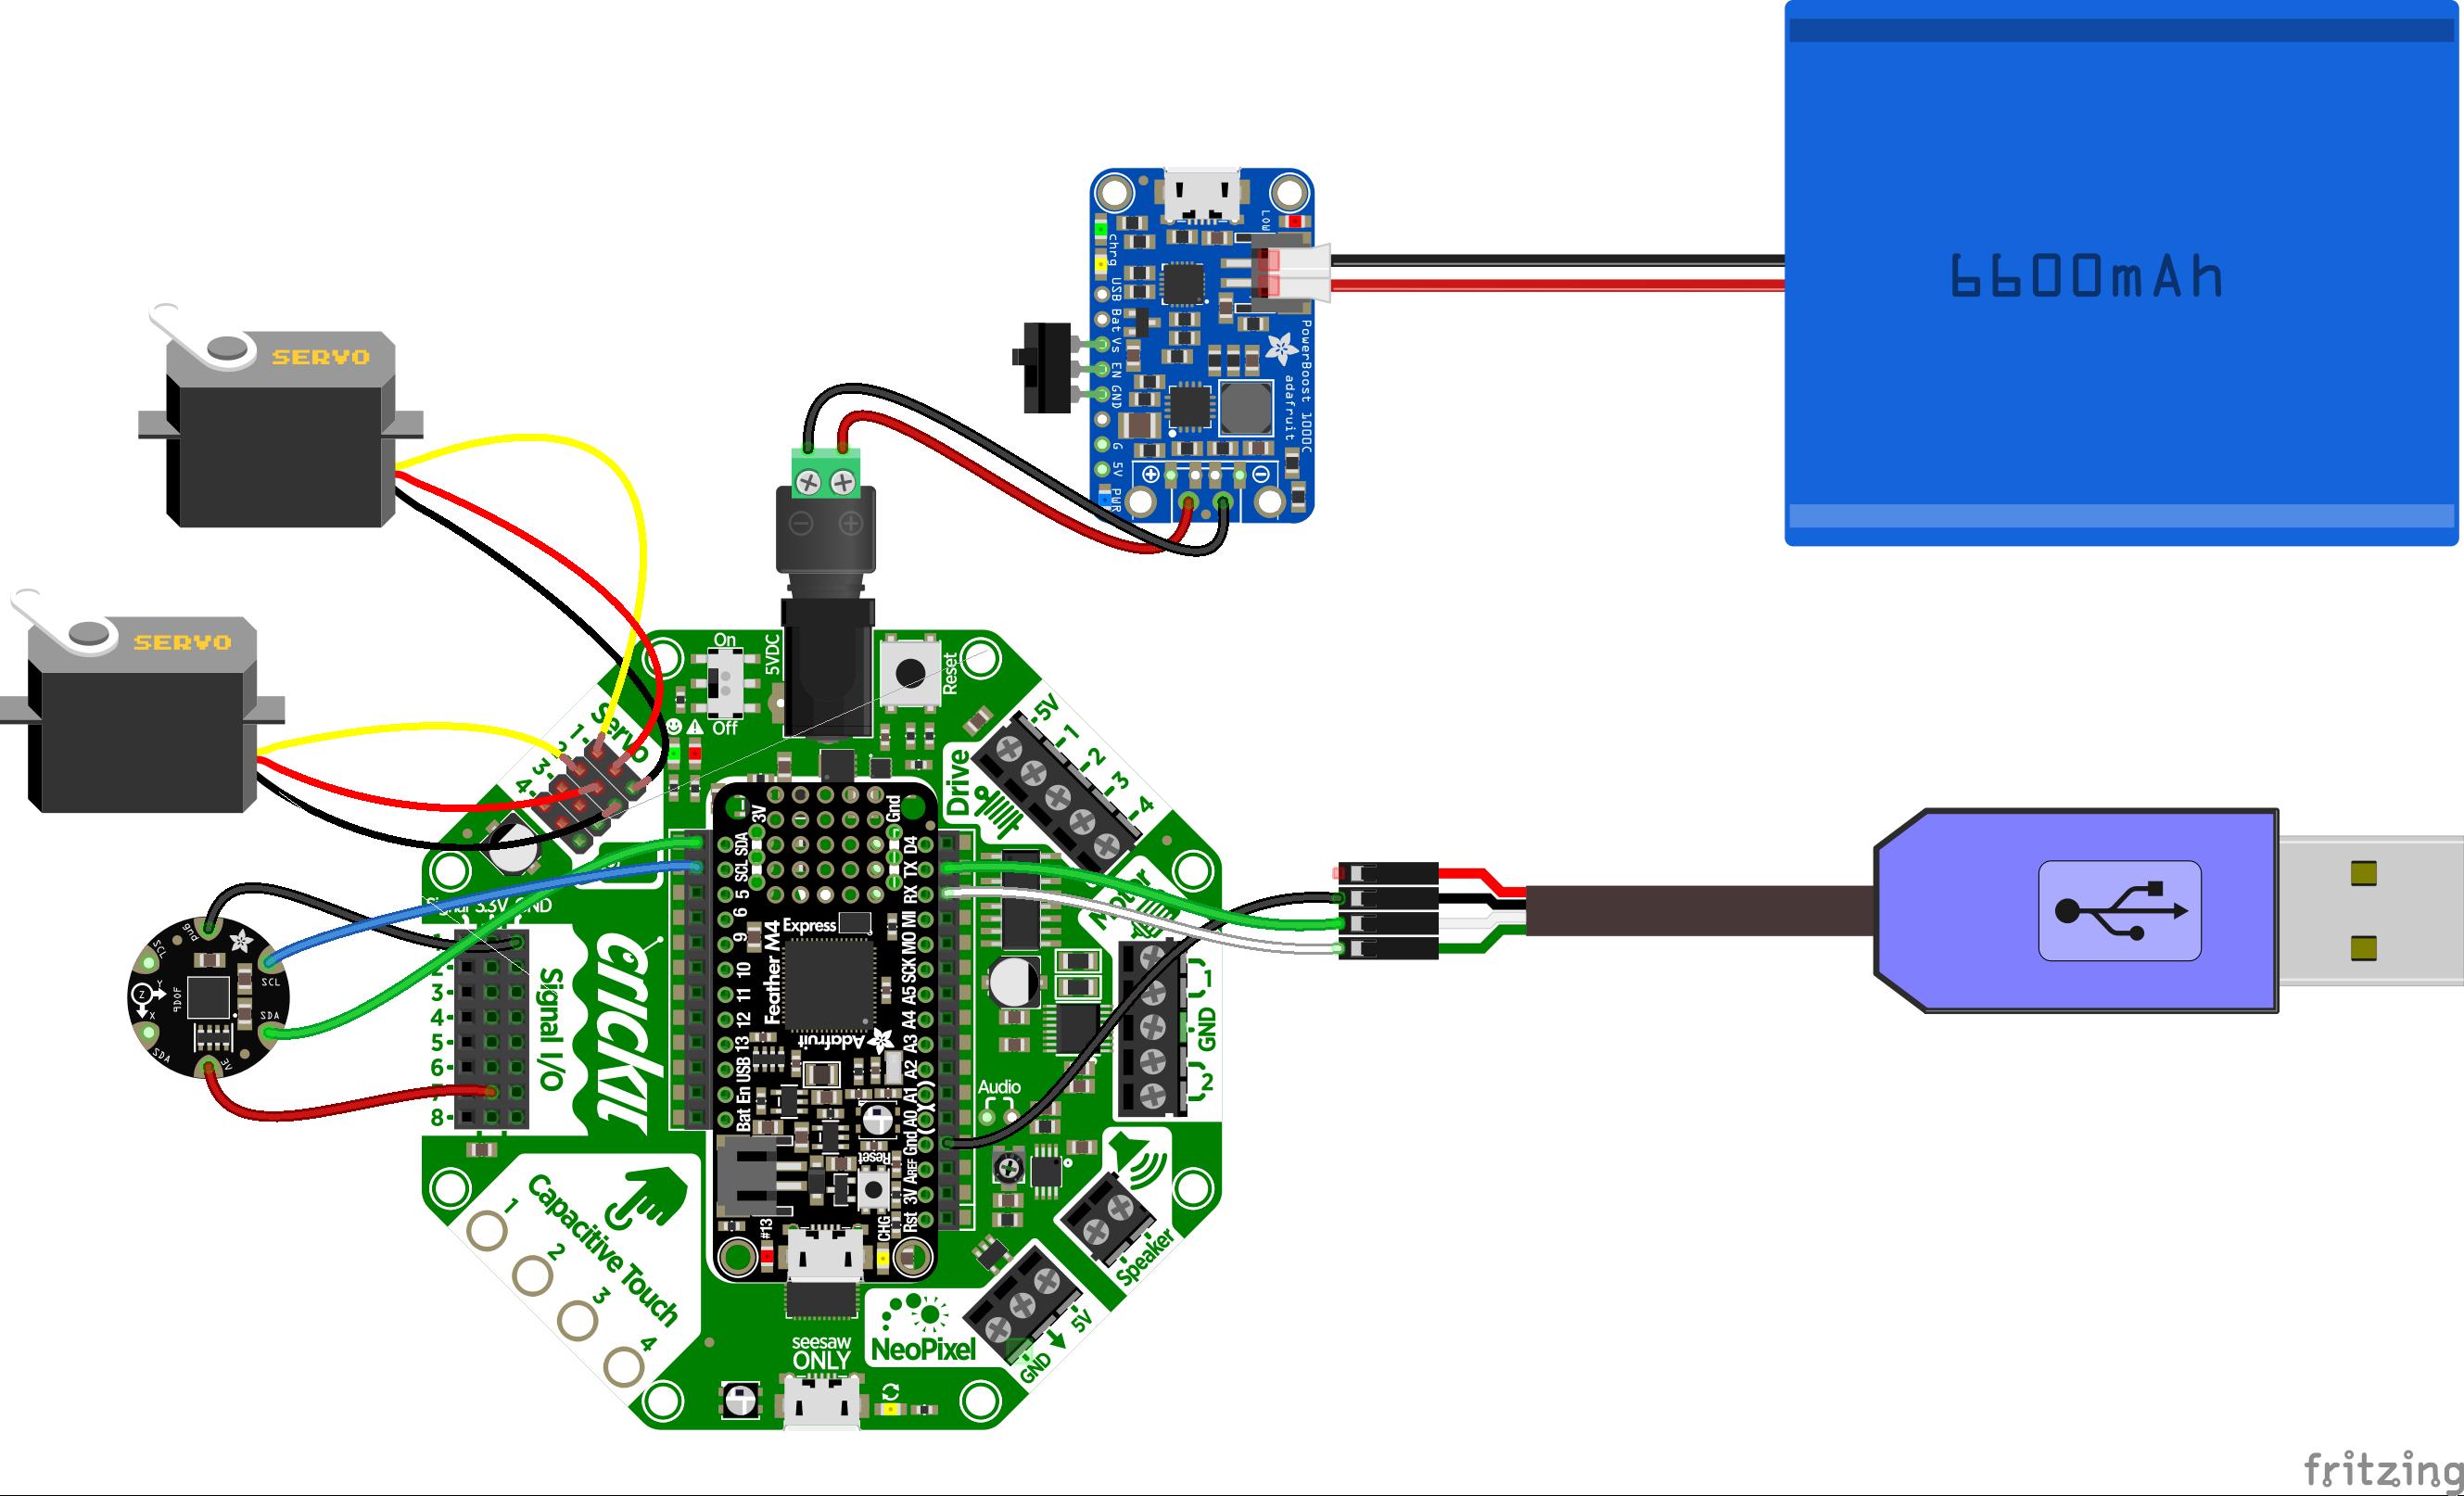 robotics___cnc_wiring.png